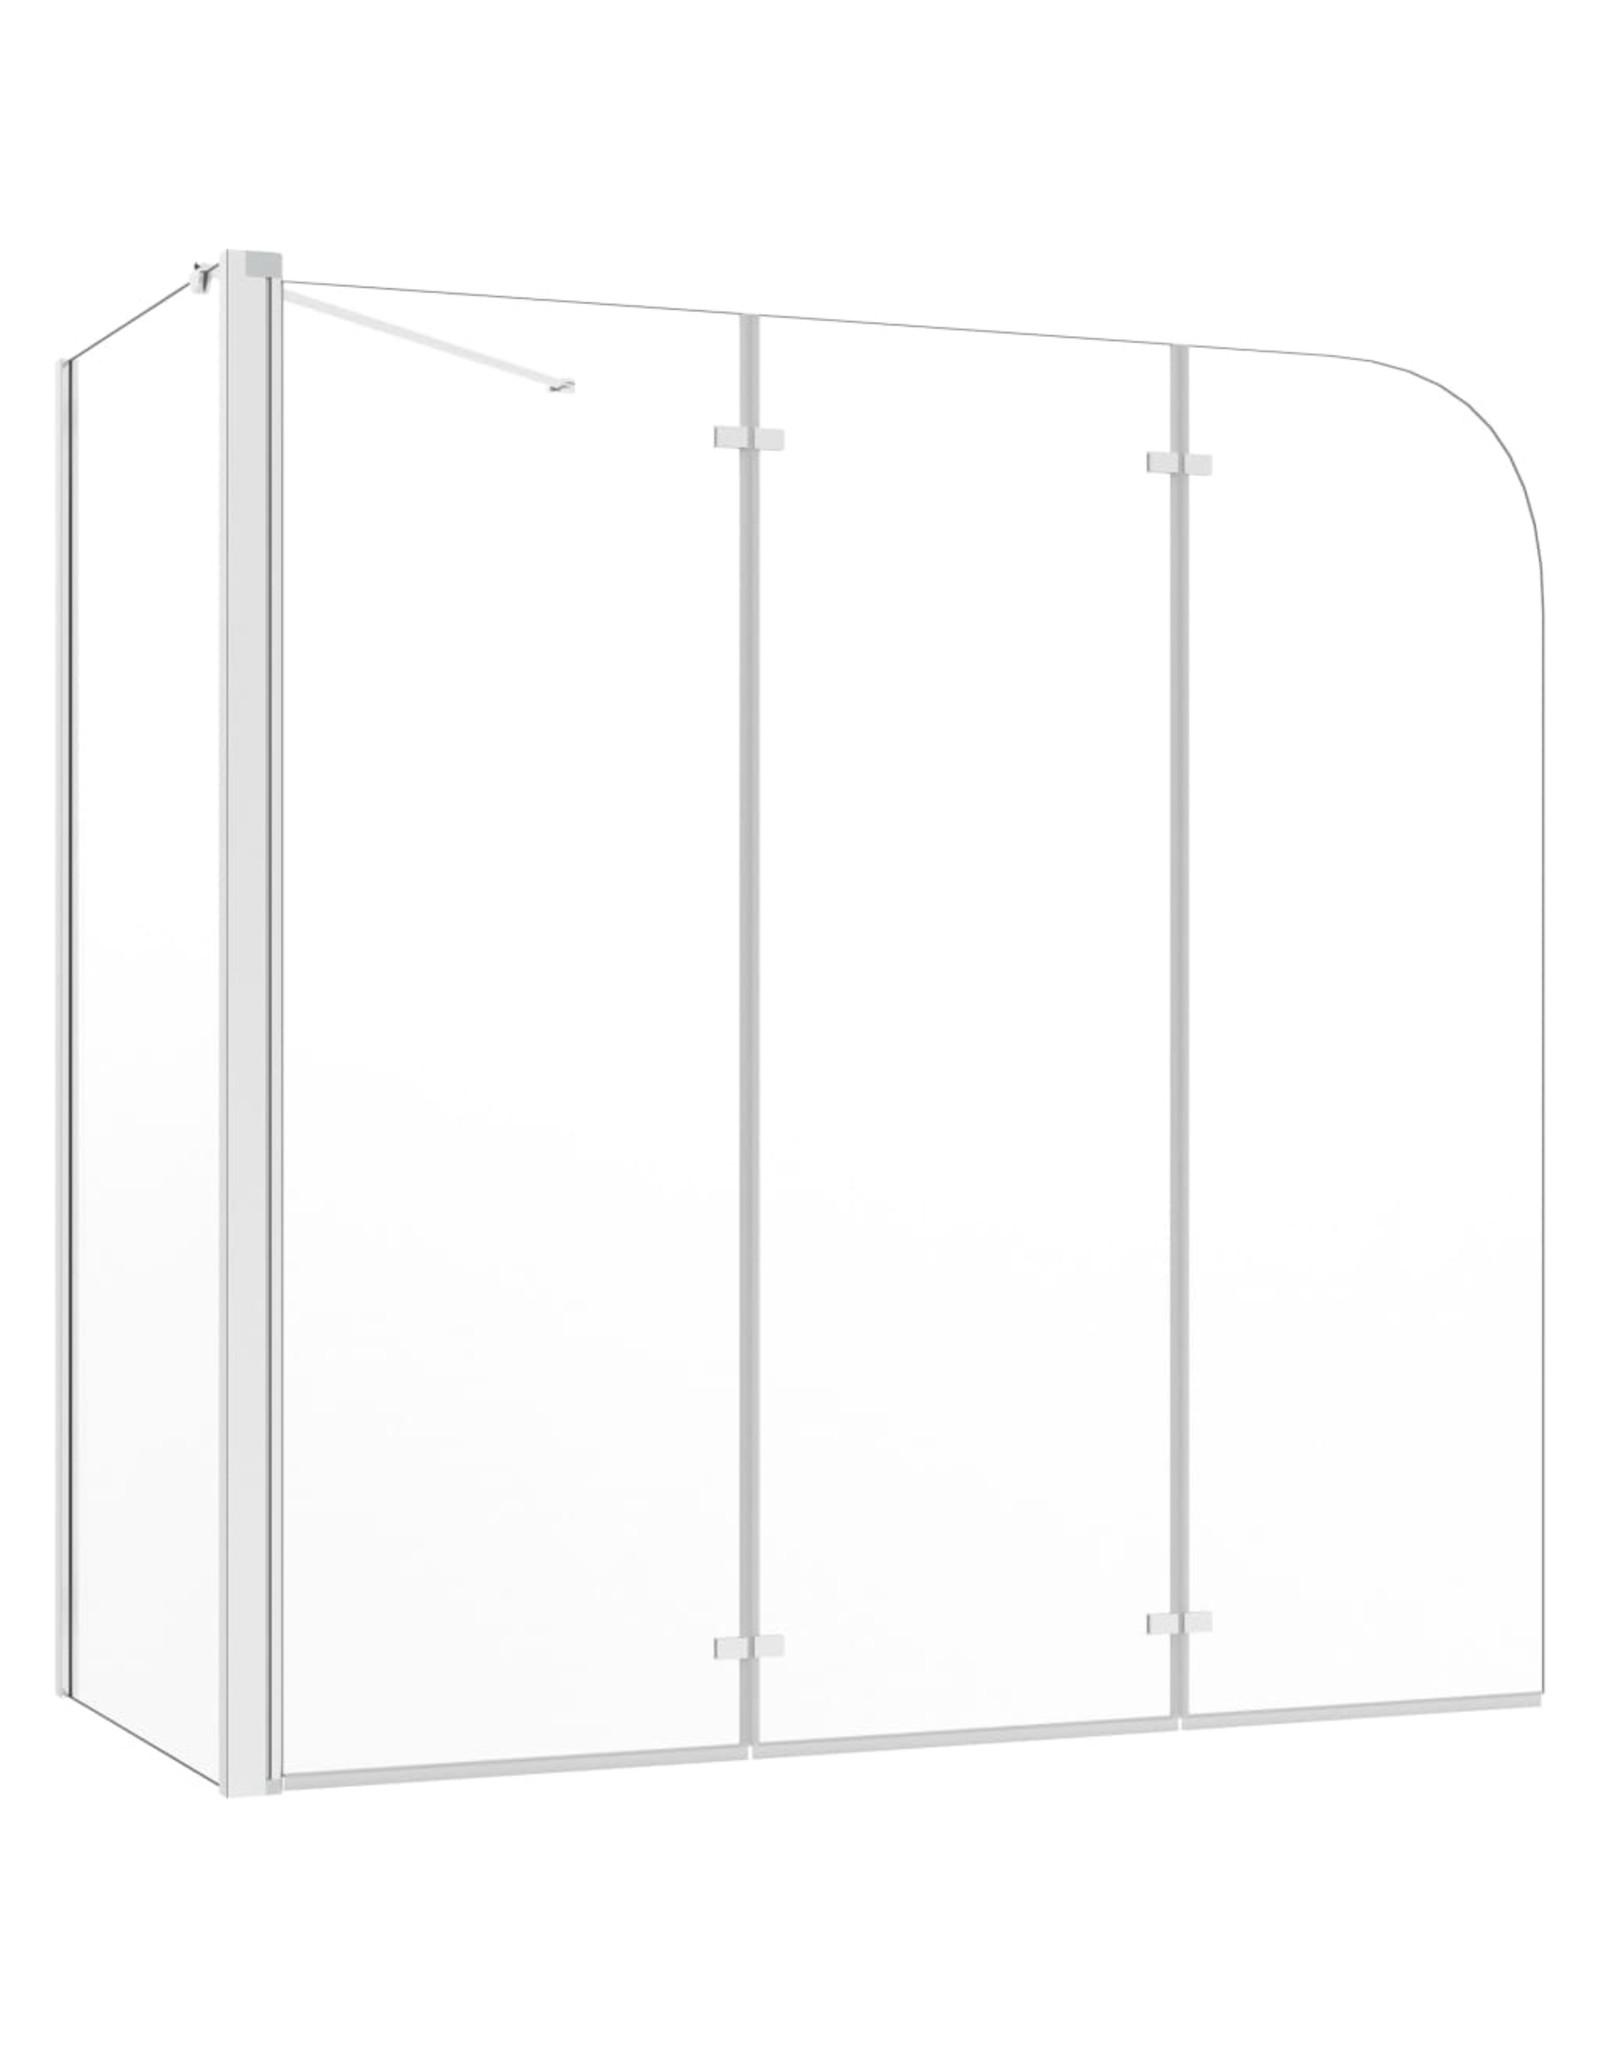 Badwand 120x69x130 cm gehard glas transparant